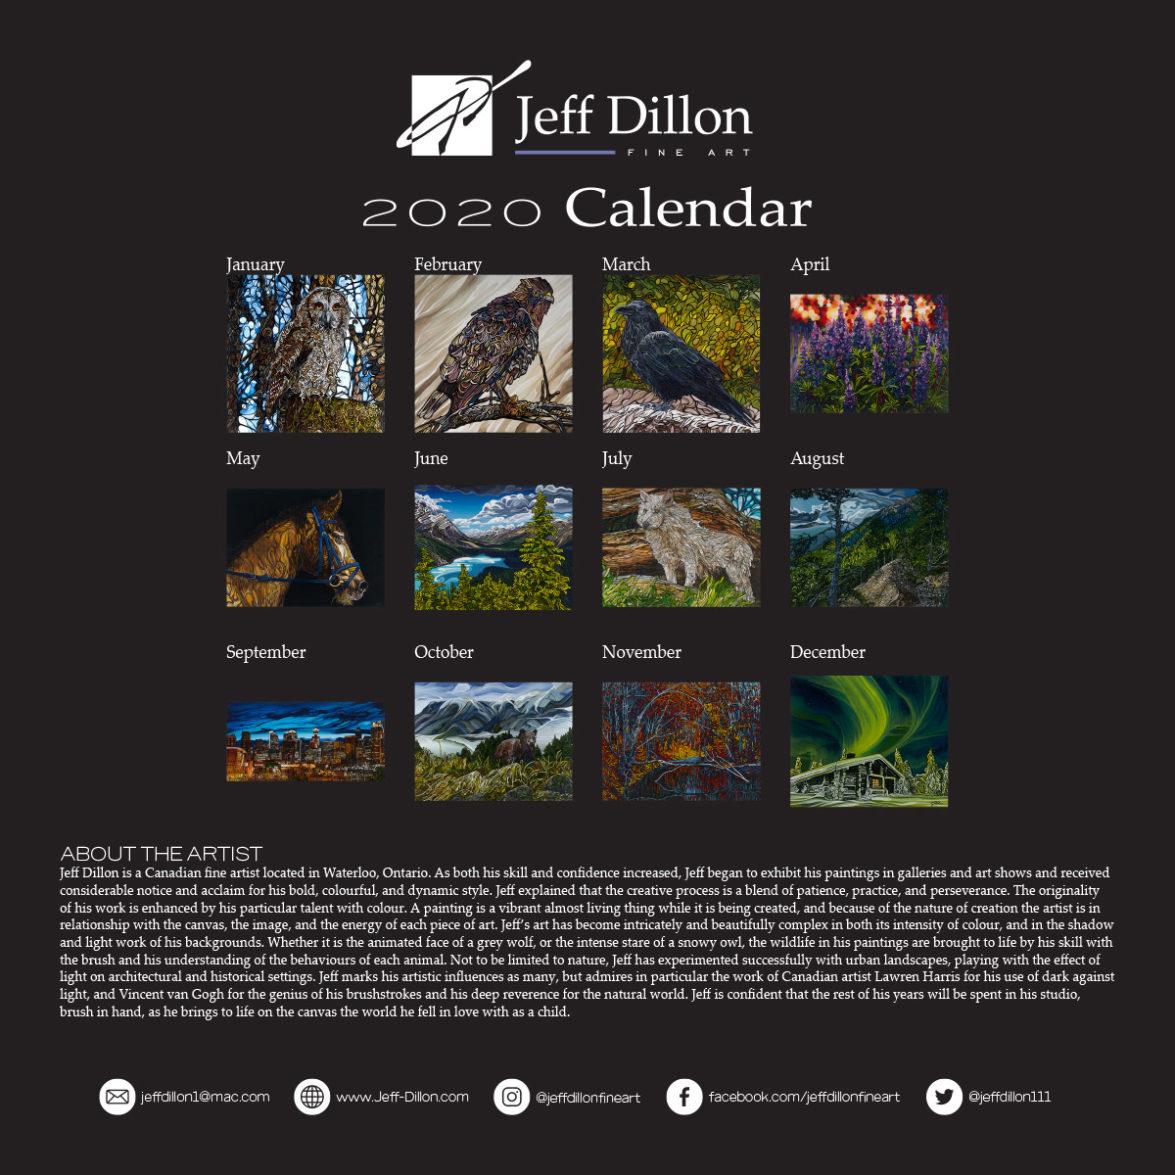 2020 calendar back